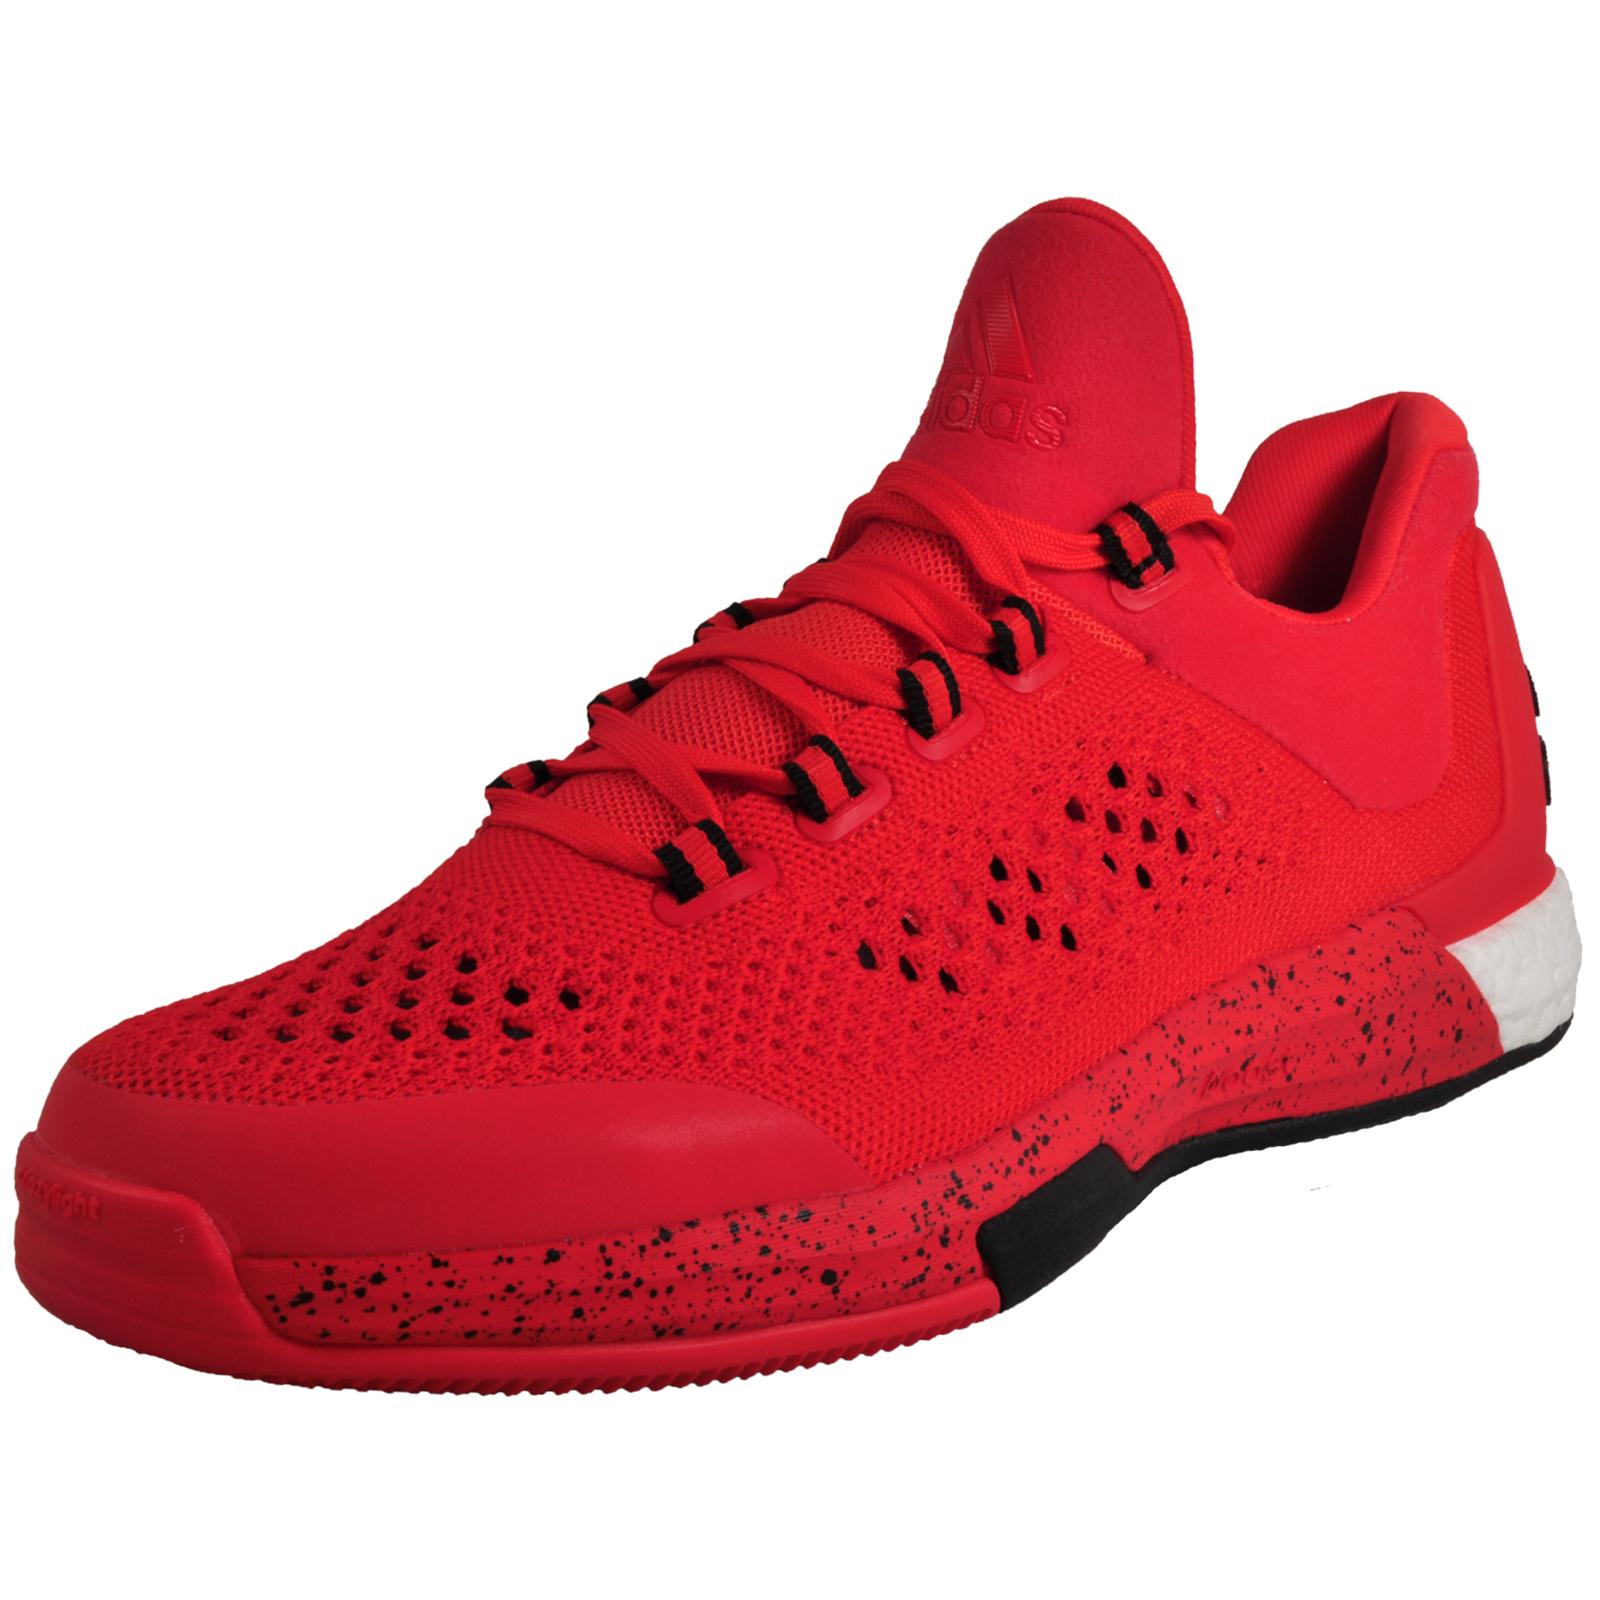 4914eb0f2fb ... sweden adidas crazylight boost primeknit premium fitness basketball  shoes trainers red 0eaf8 3de0e